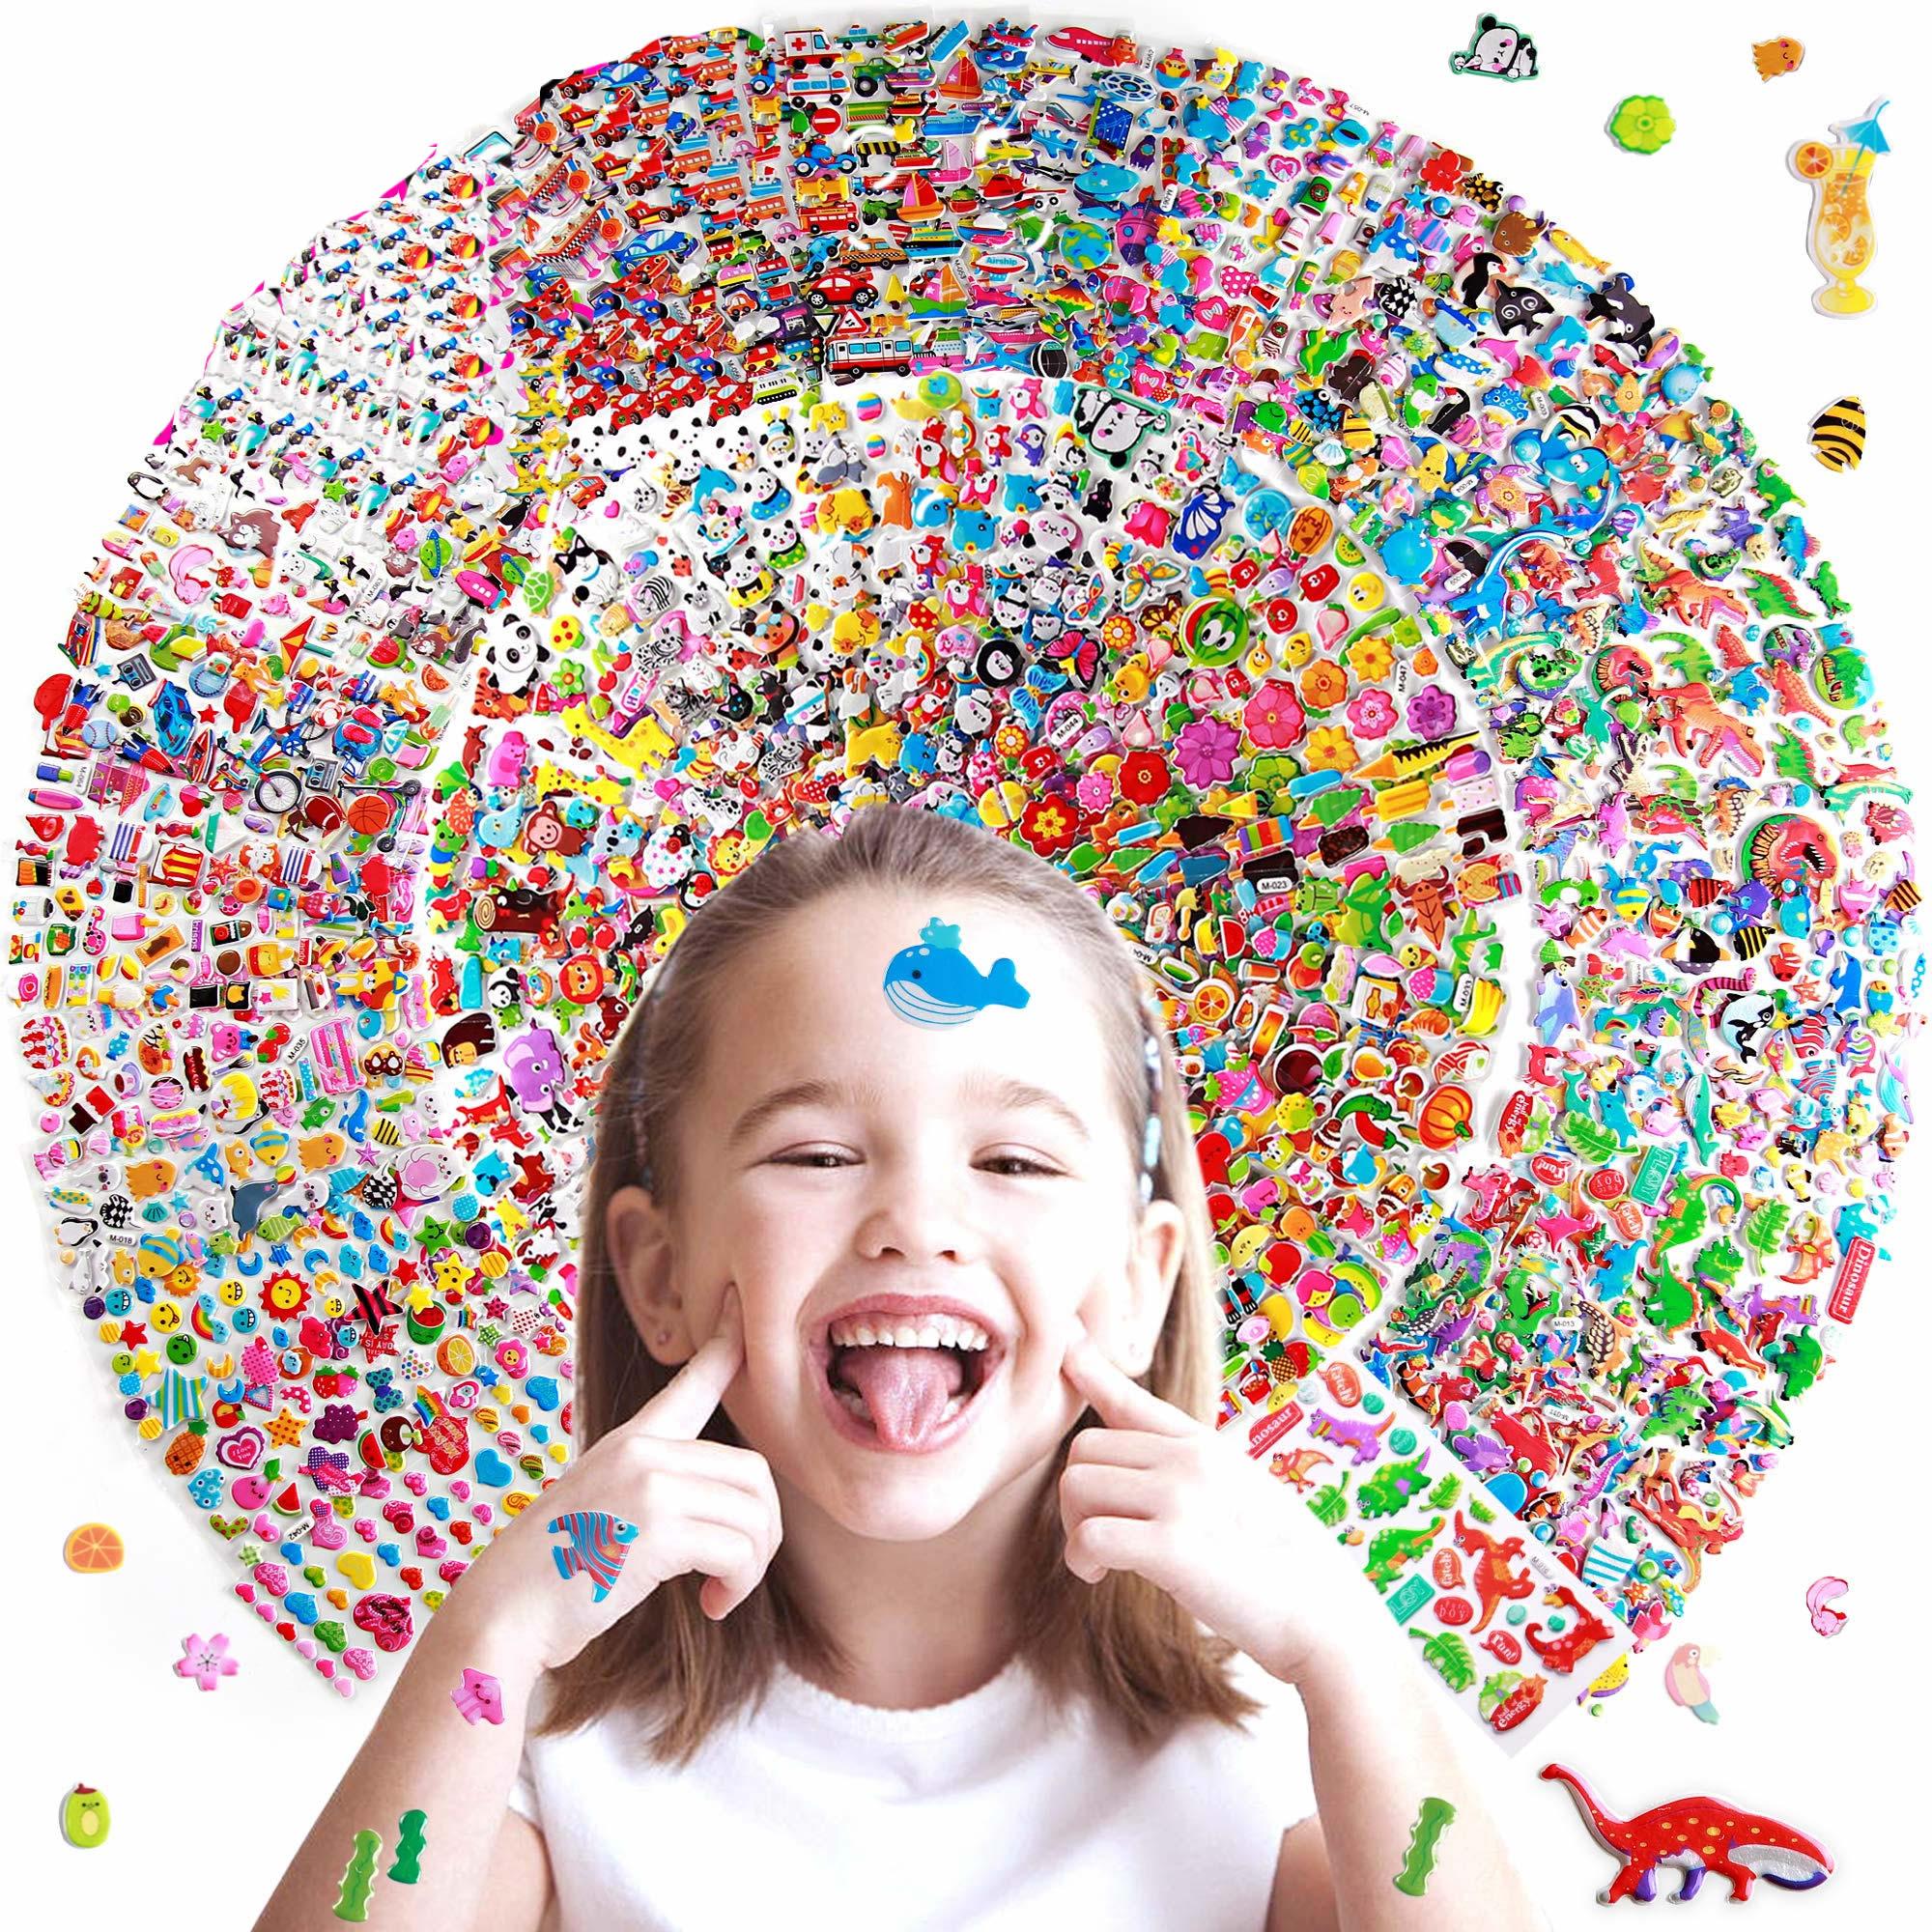 Random Different Cartoon Animals 3D Puffy Bulk Stickers Waterproof PVC Anime Kids Scrapbooking Girl Boy DIY Reward Gift Sticker